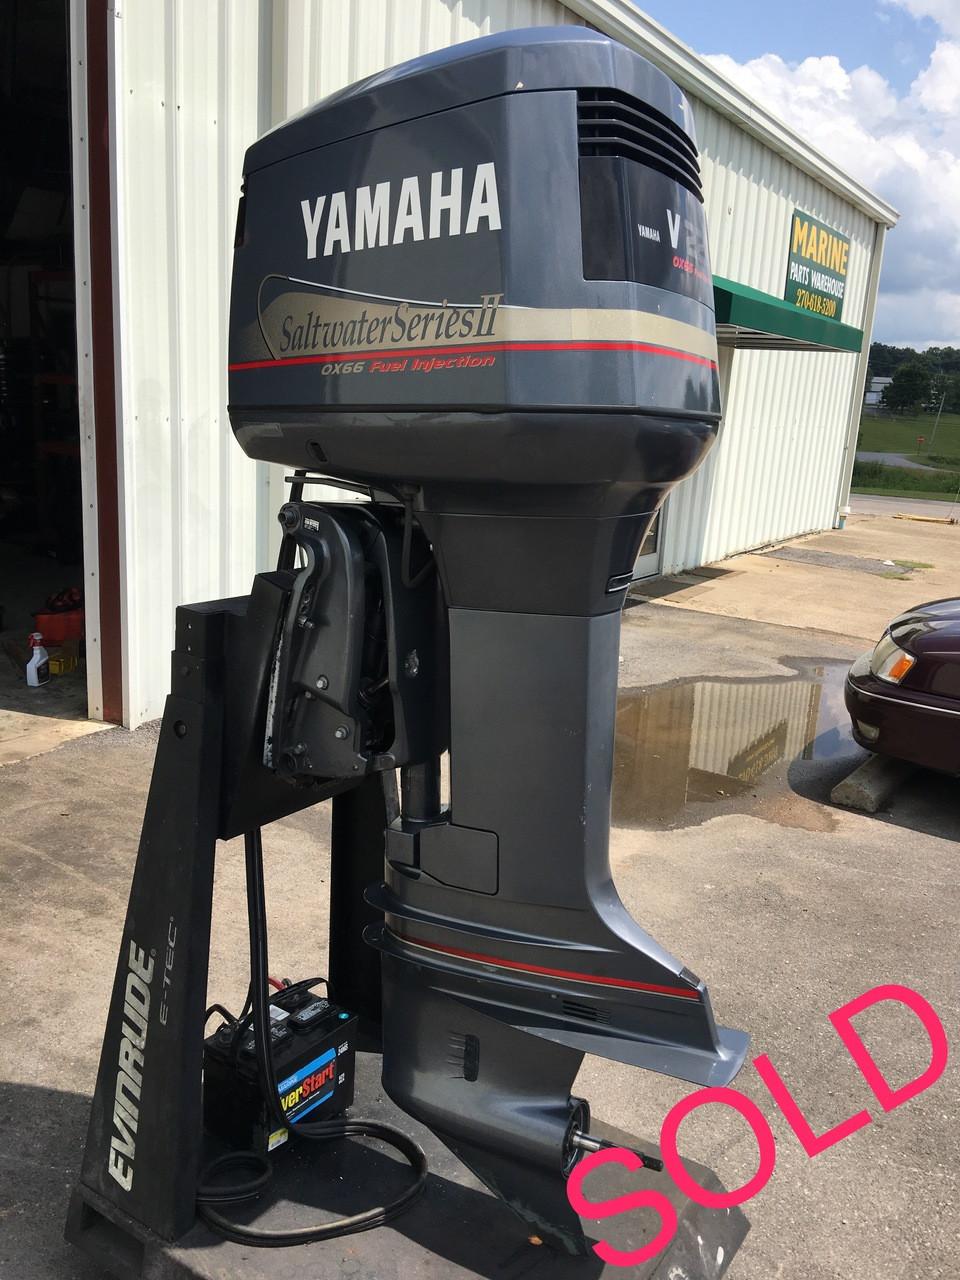 2001 Yamaha V225 Saltwater Series II OX66 Fuel Injection 3 1